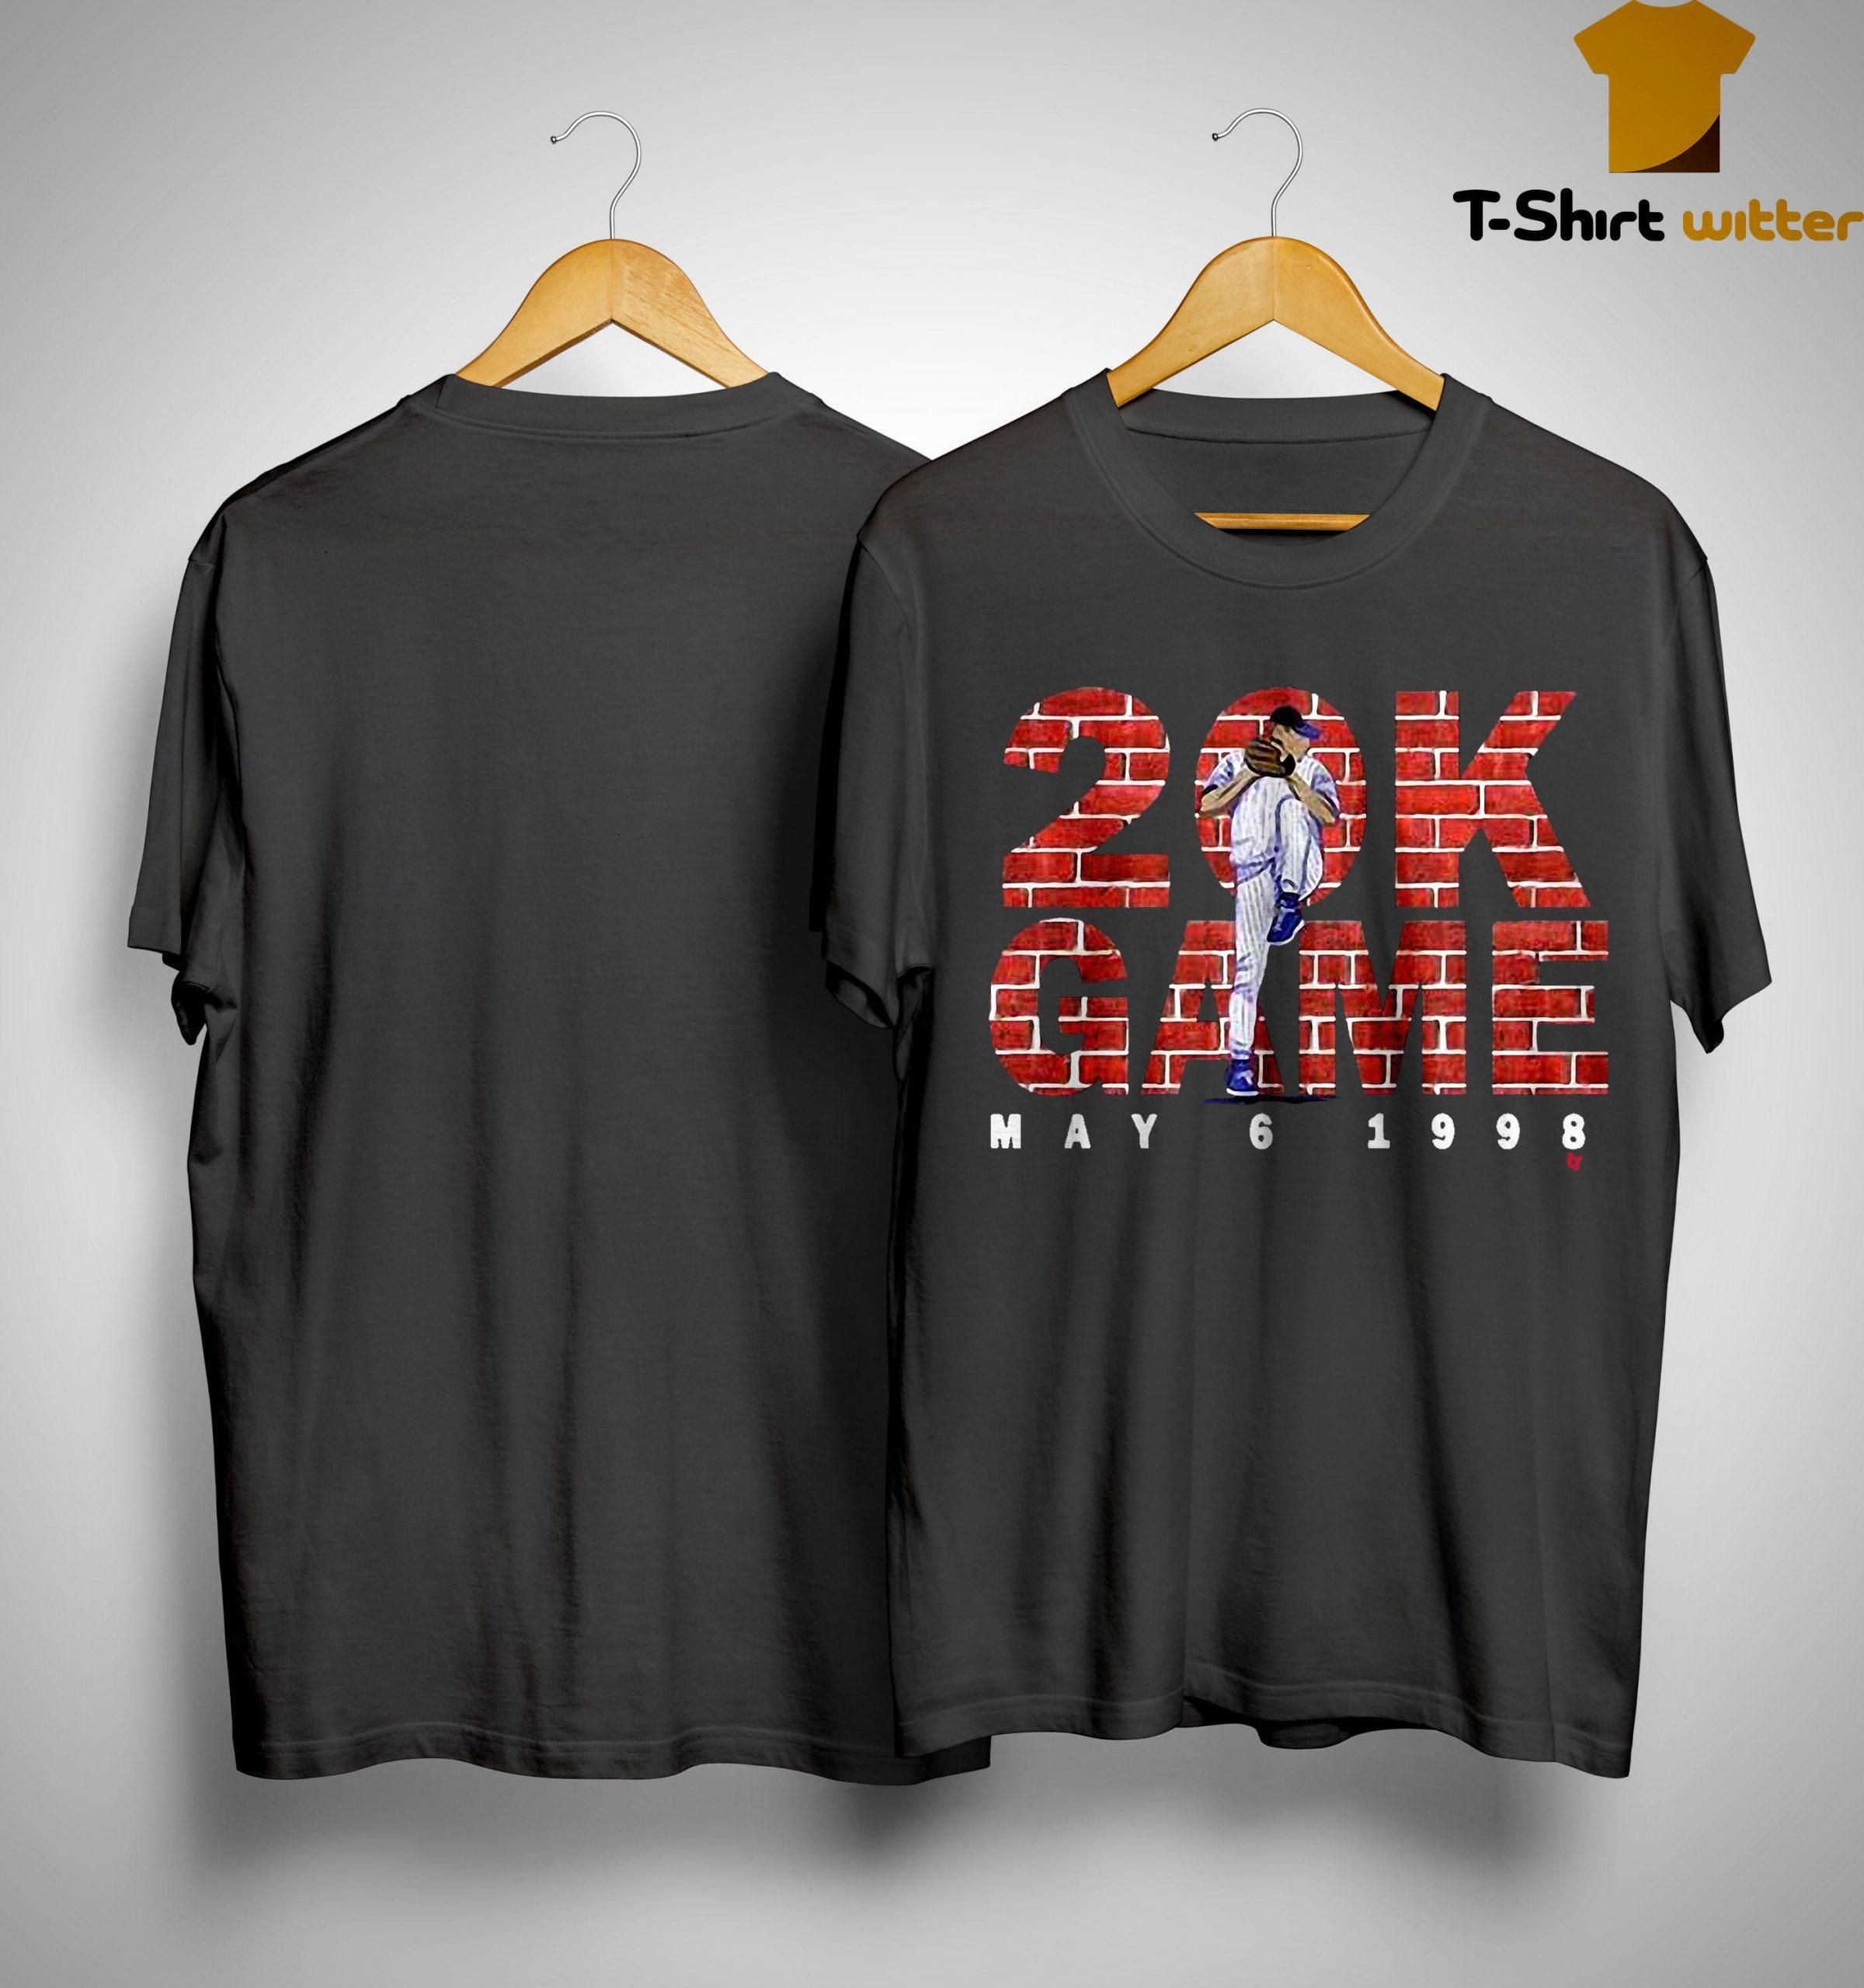 Kerry Wood 20 K Game Shirt